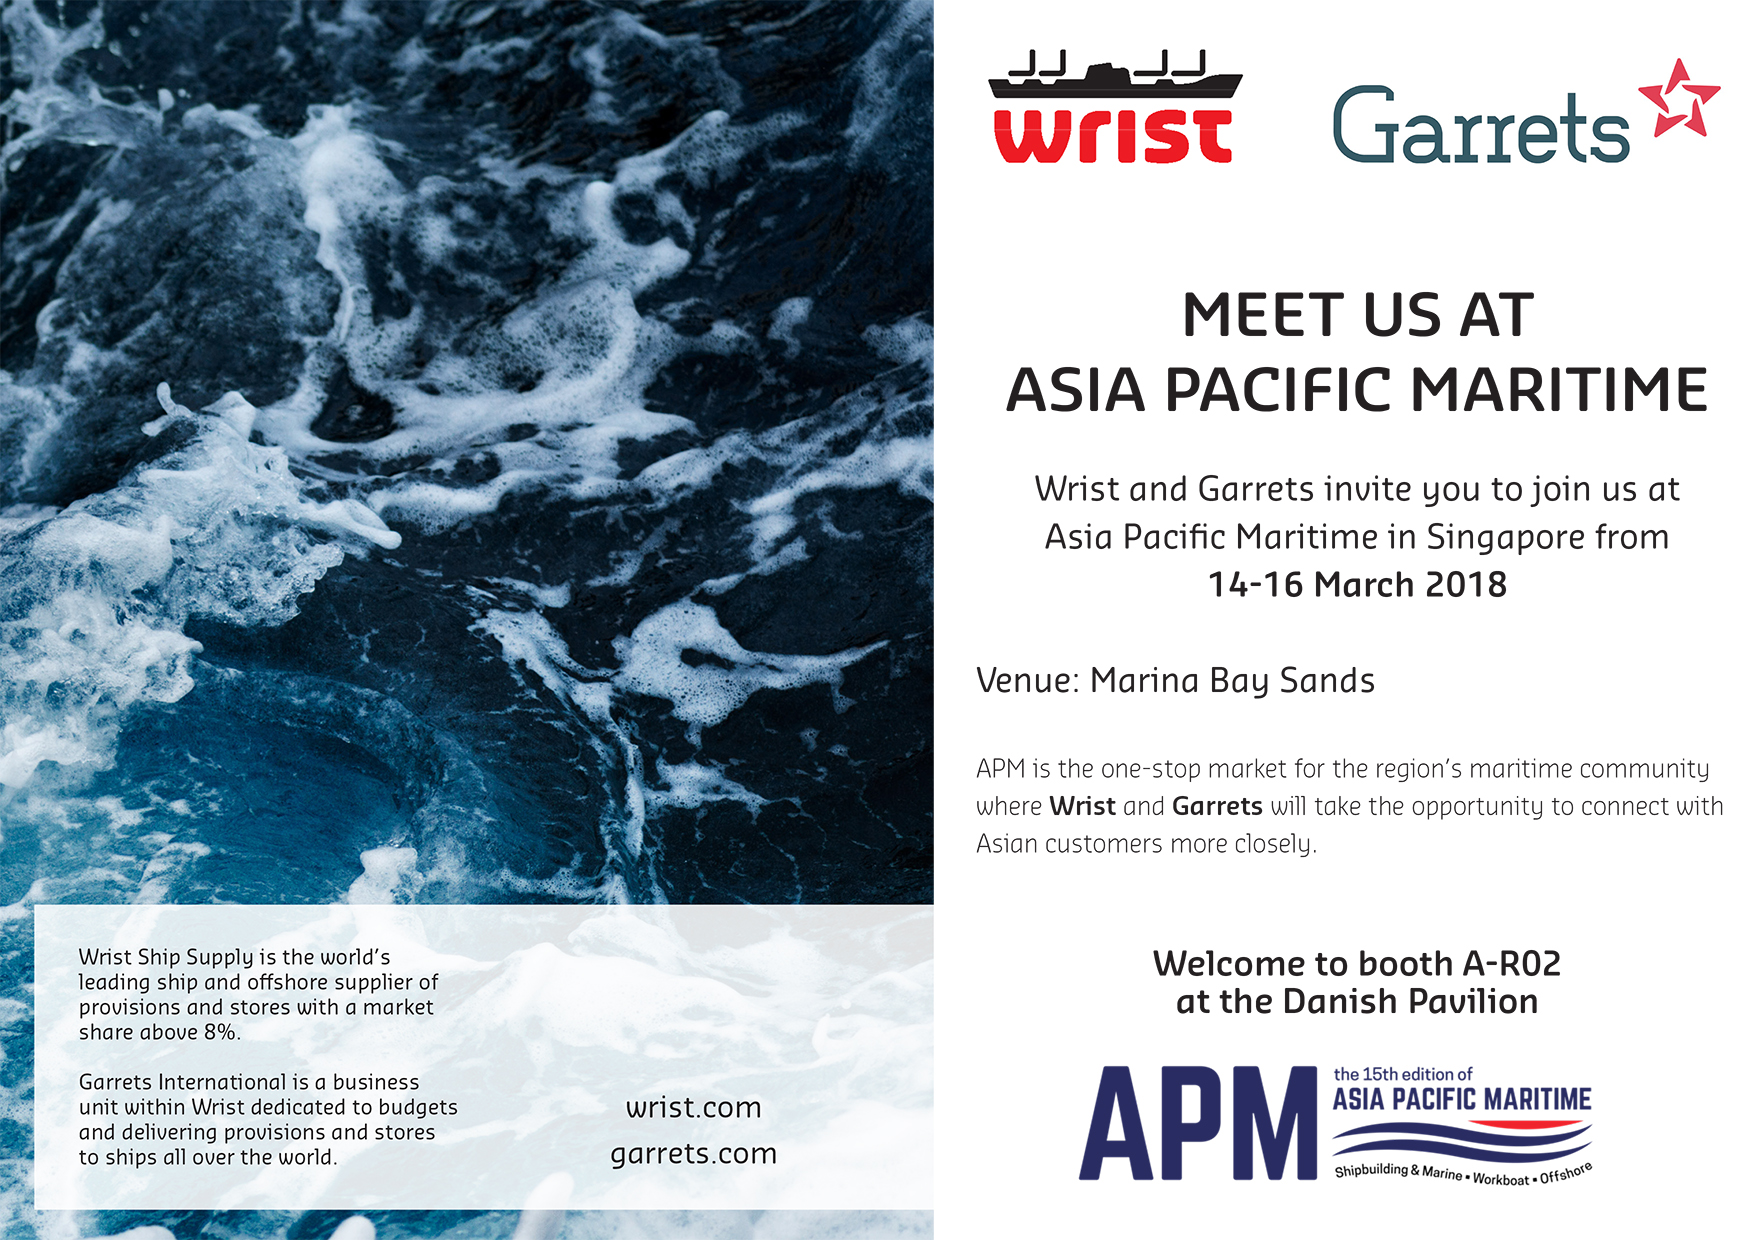 Garrets International Meet us at Asia Pacific Maritime